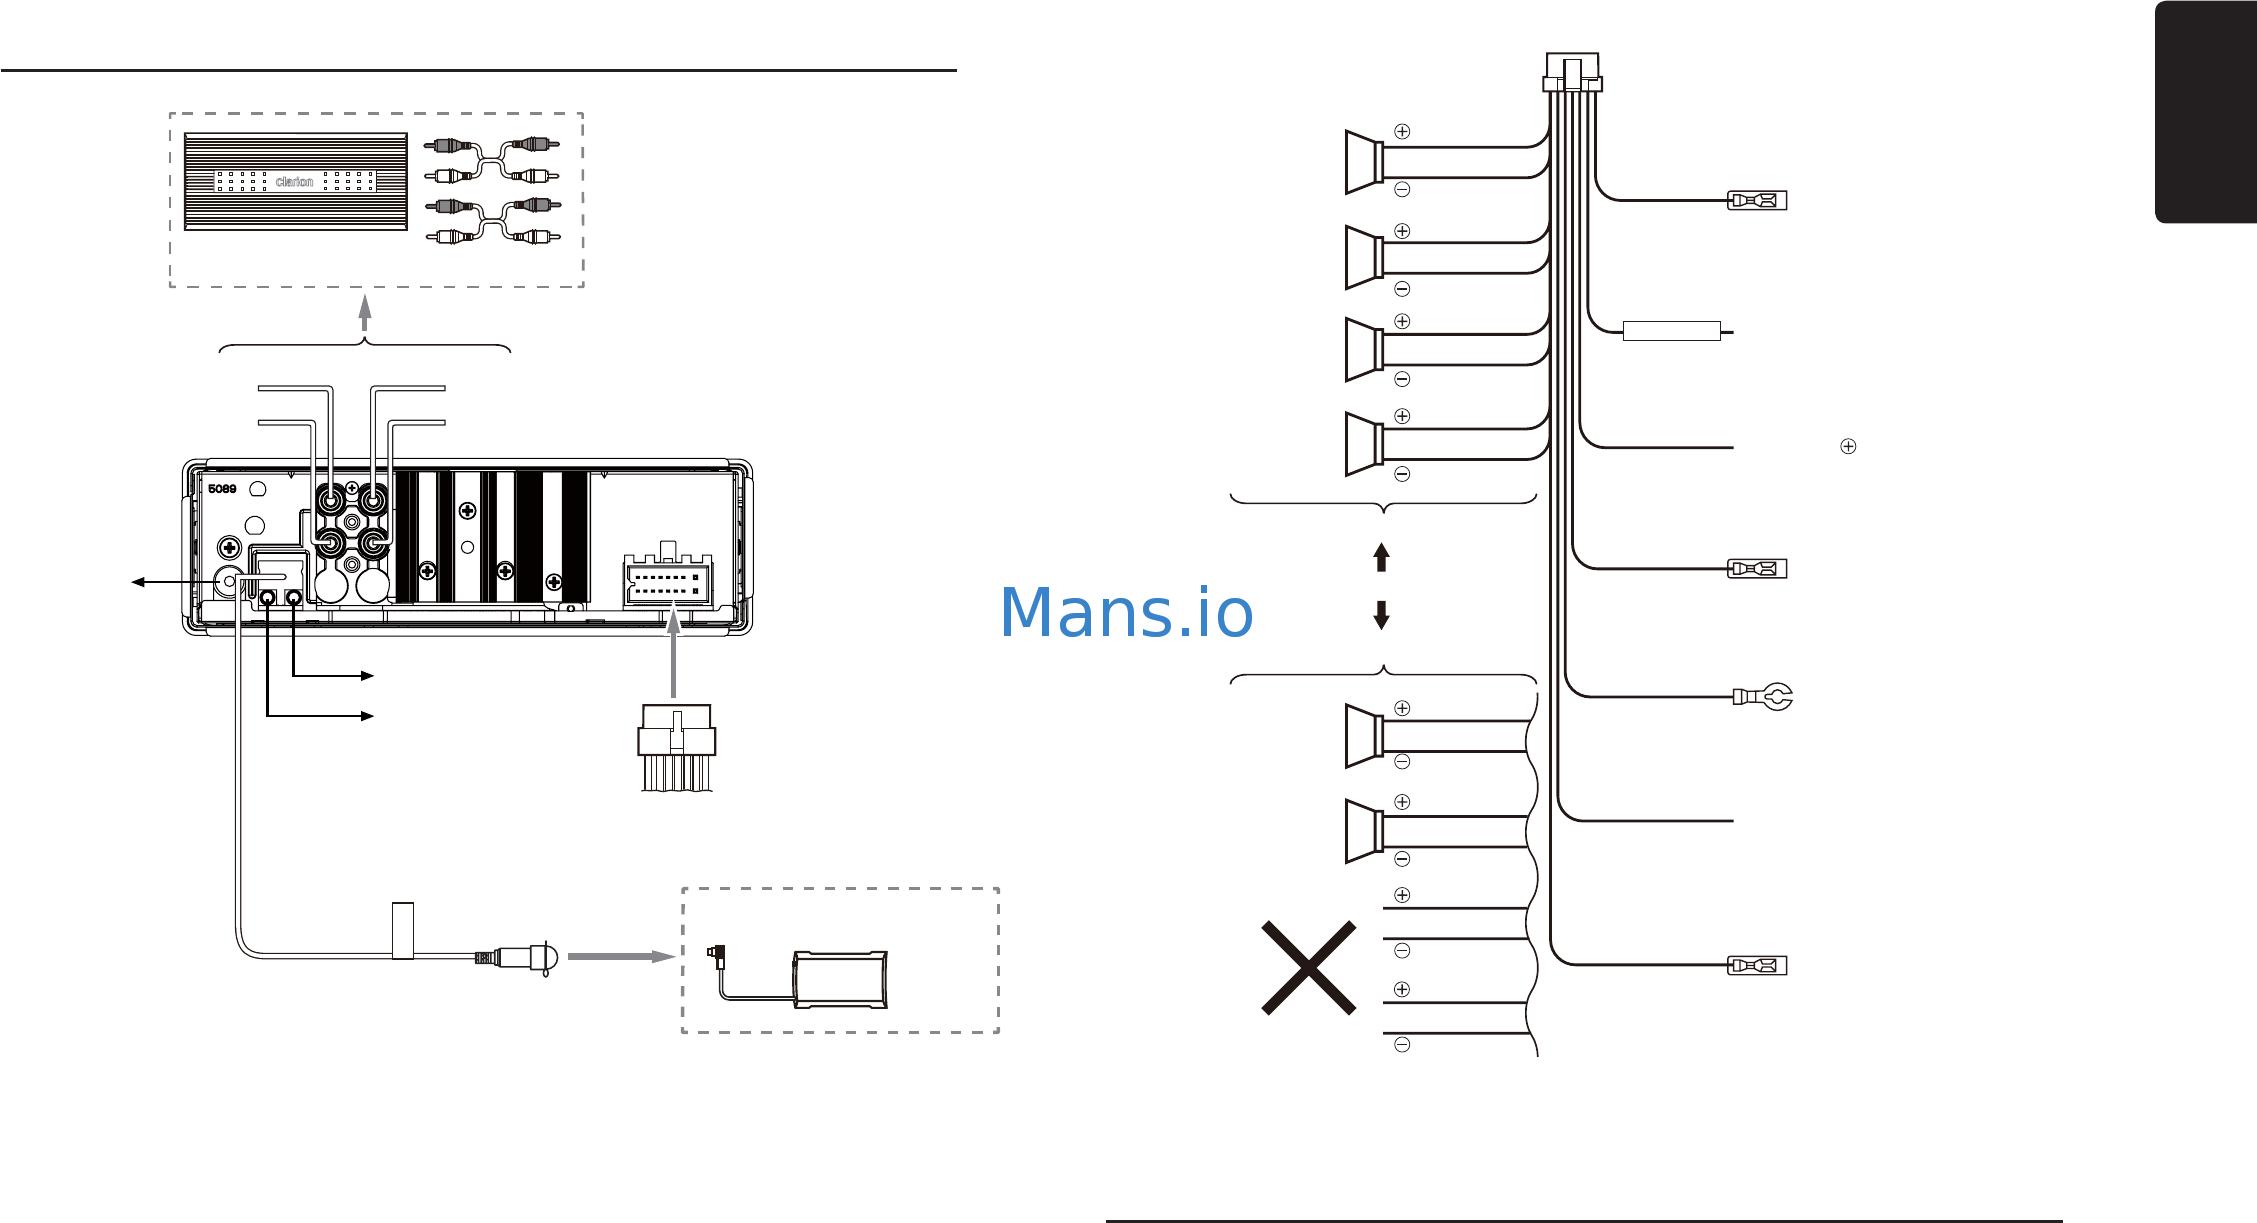 Clarion Vrx485vd Wiring Diagram Full